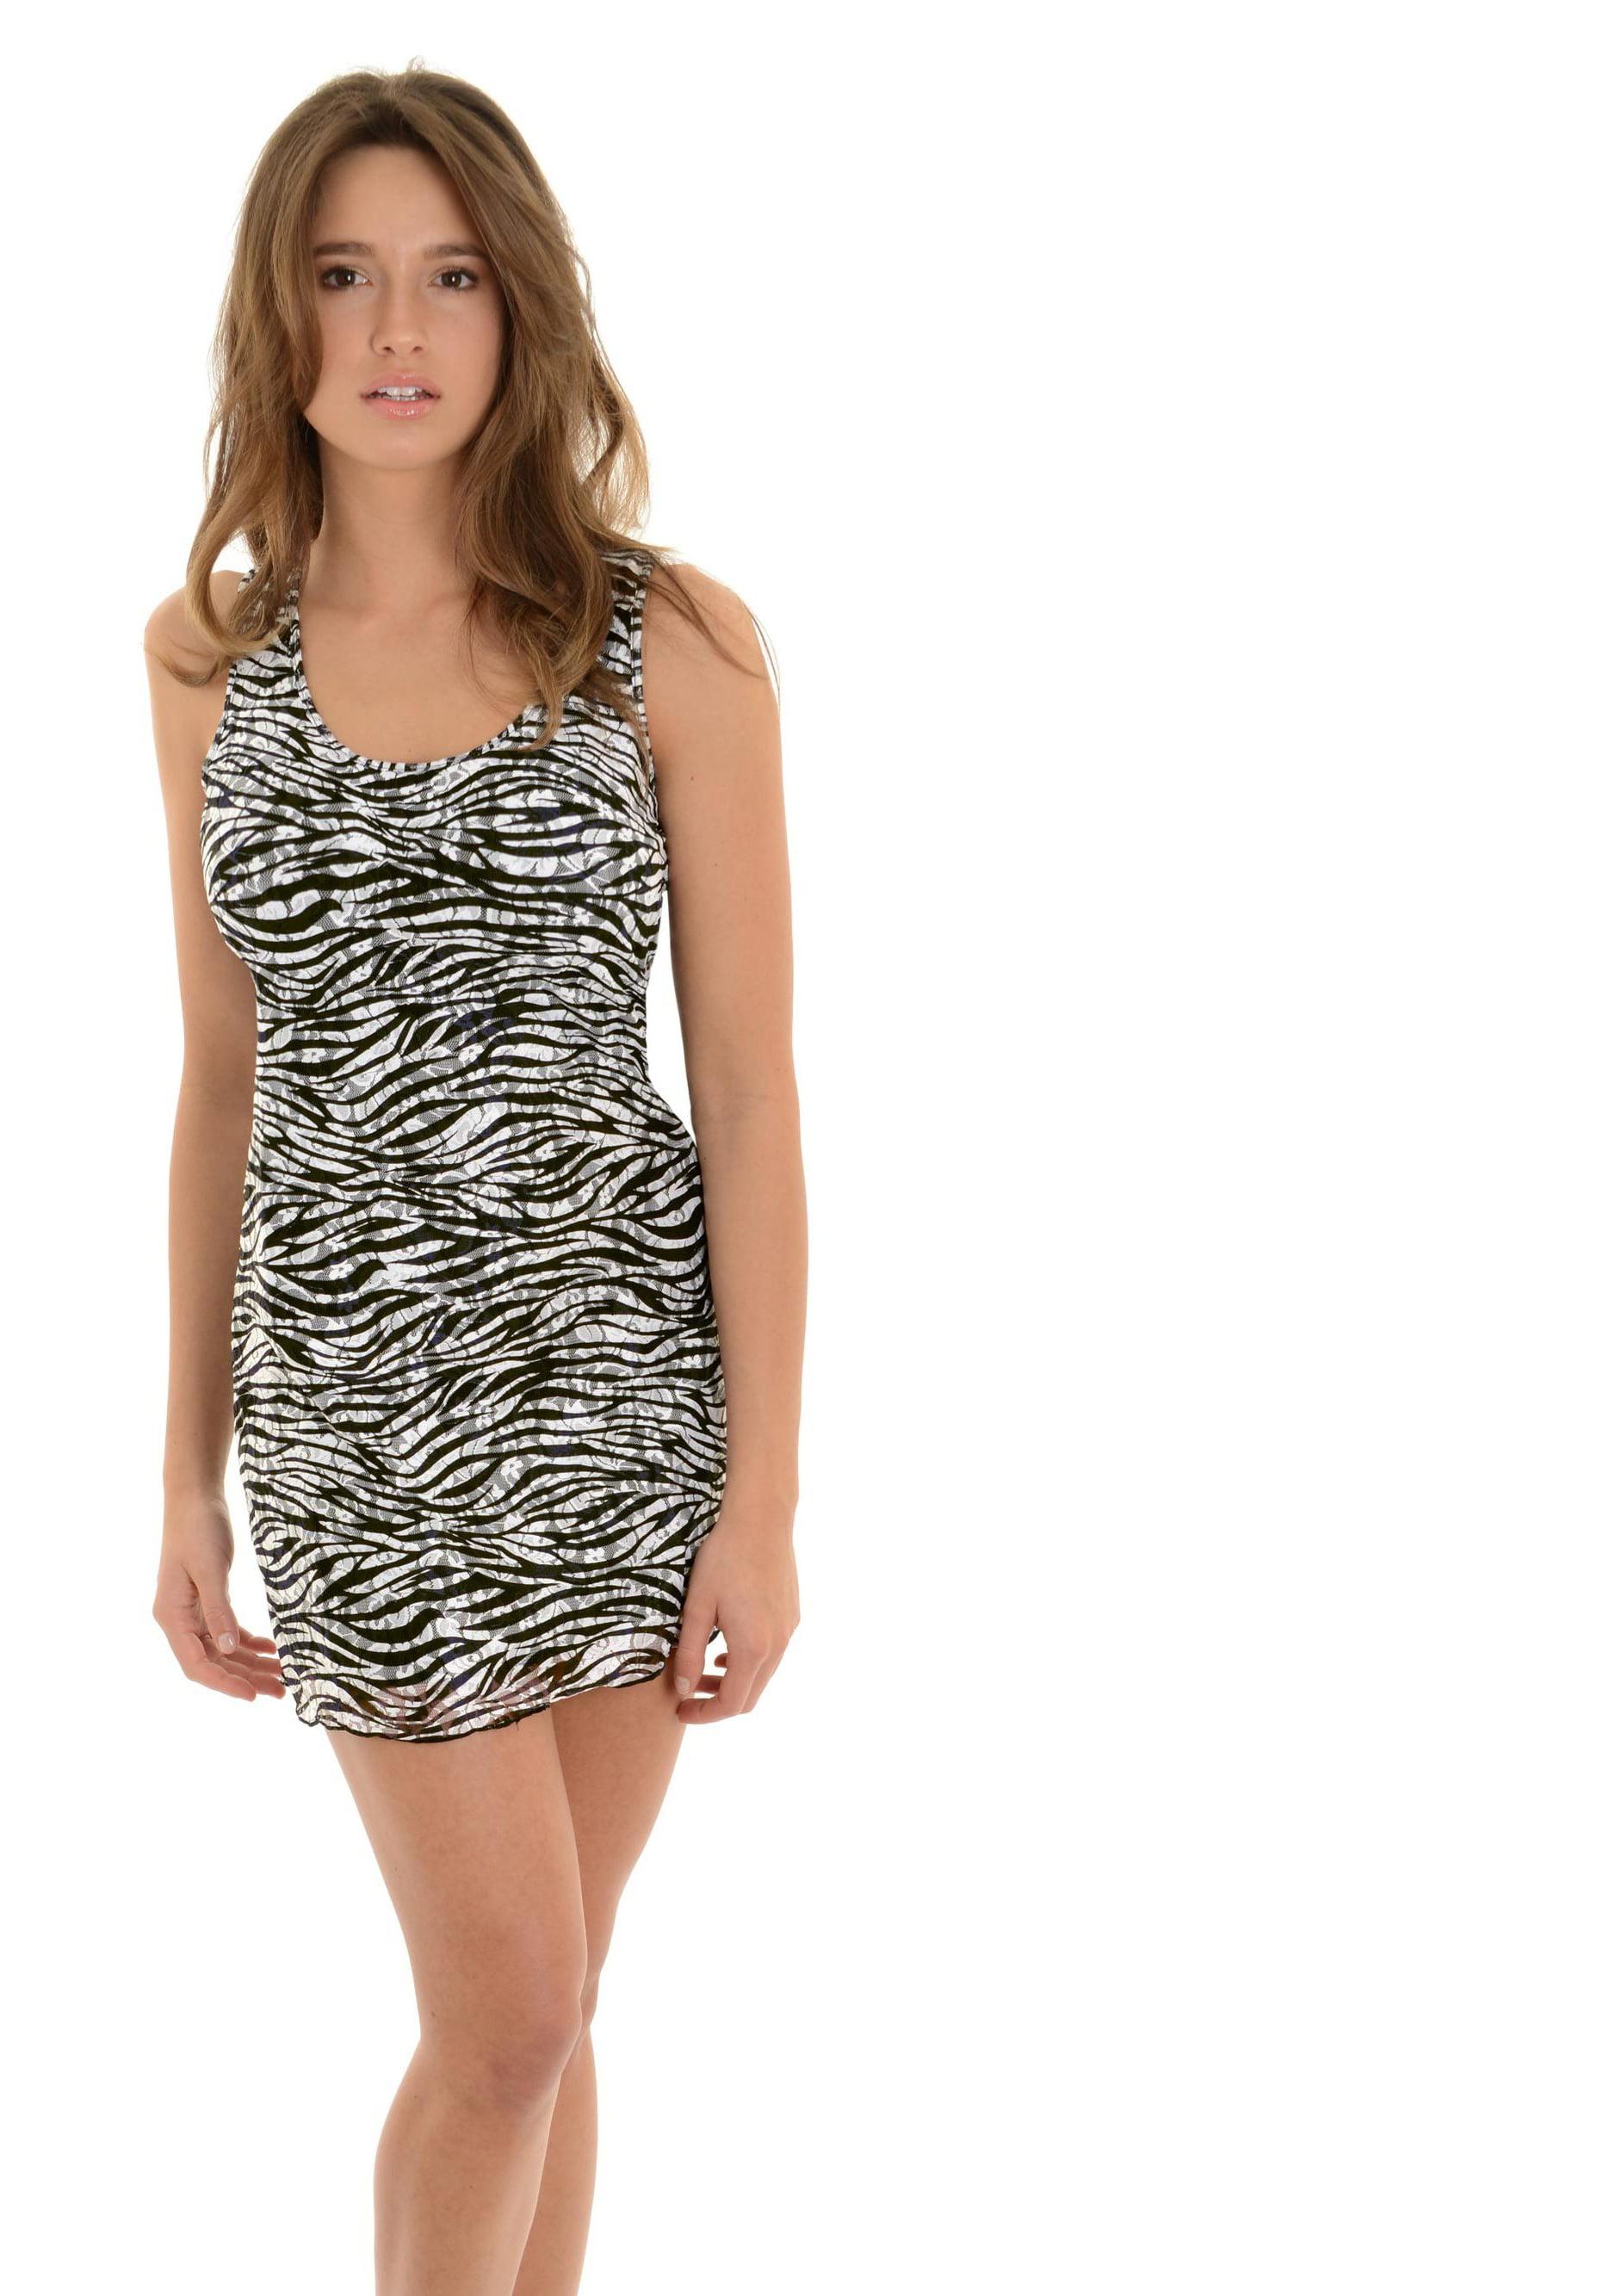 b7ec5bb2e0 Kontacious - Juniors Zebra Print Mini Dress Black White Dress Overlay  Racerback - Walmart.com